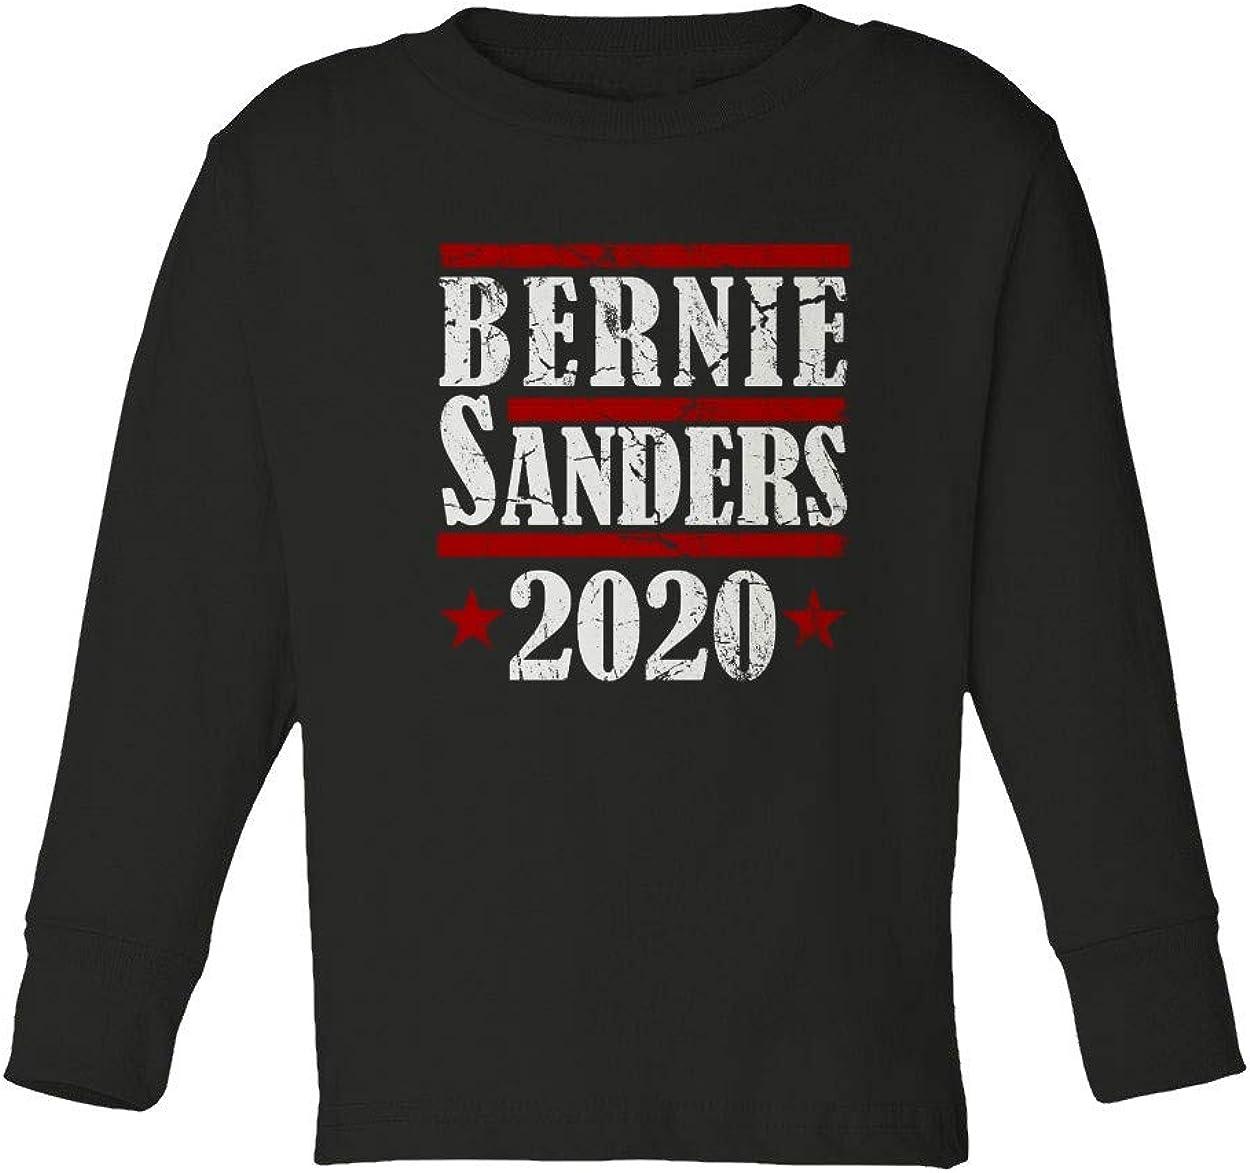 KING THREADS Bernie Sanders 2020 Presidential Election Toddler Long Sleeve T-Shirt